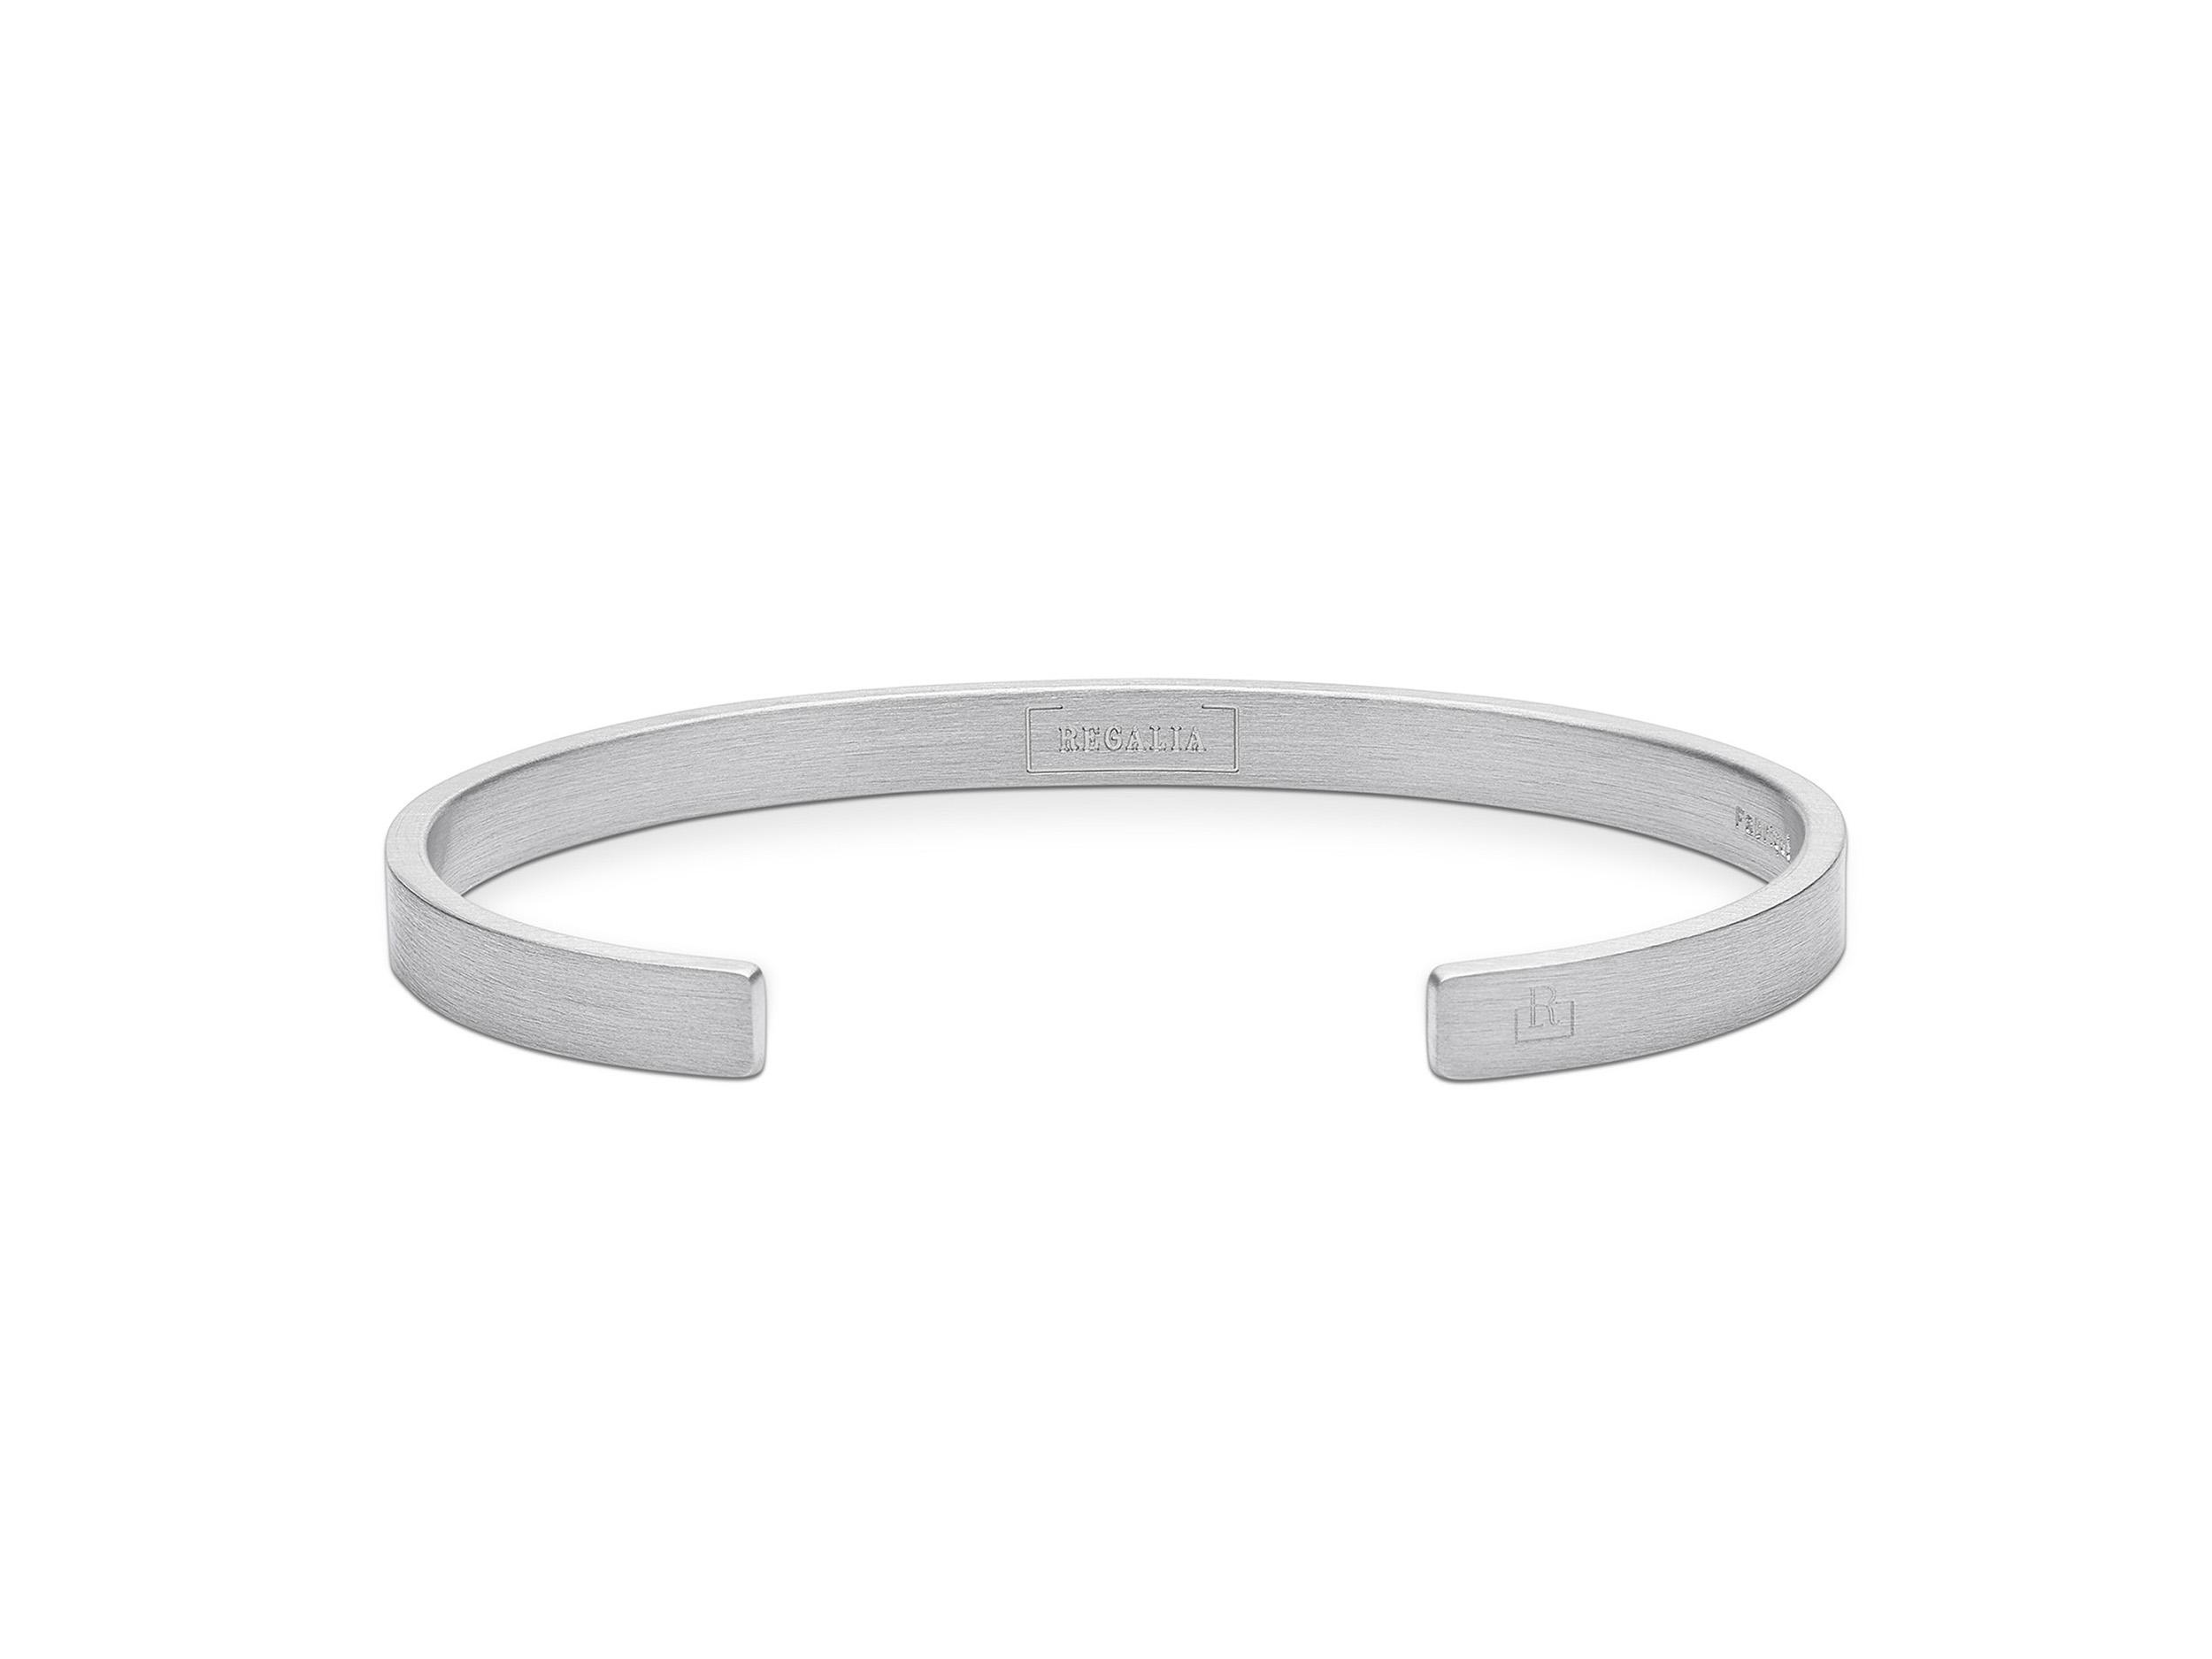 Regalia bijou bracelet argent massif homme femme-REN5B1